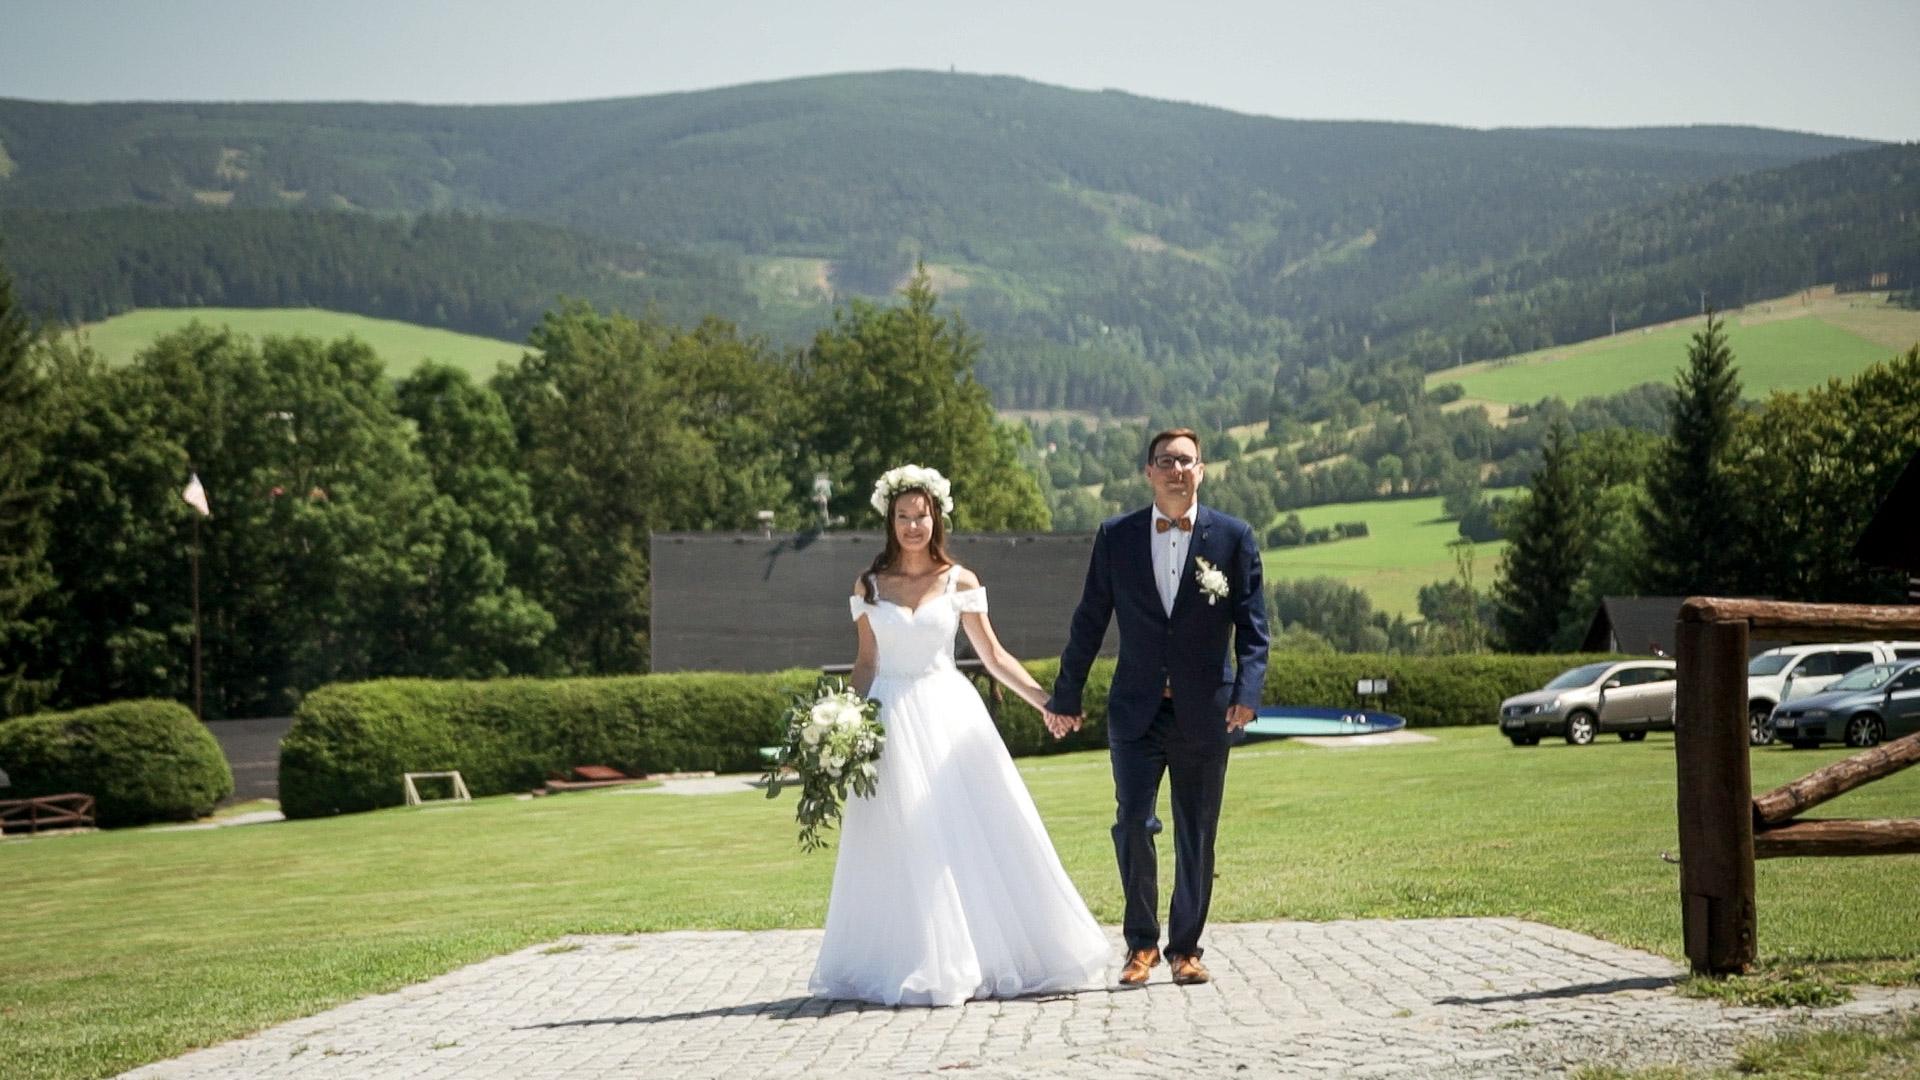 Svatba v Orlických horách v Deštné - Chalupa U Supa